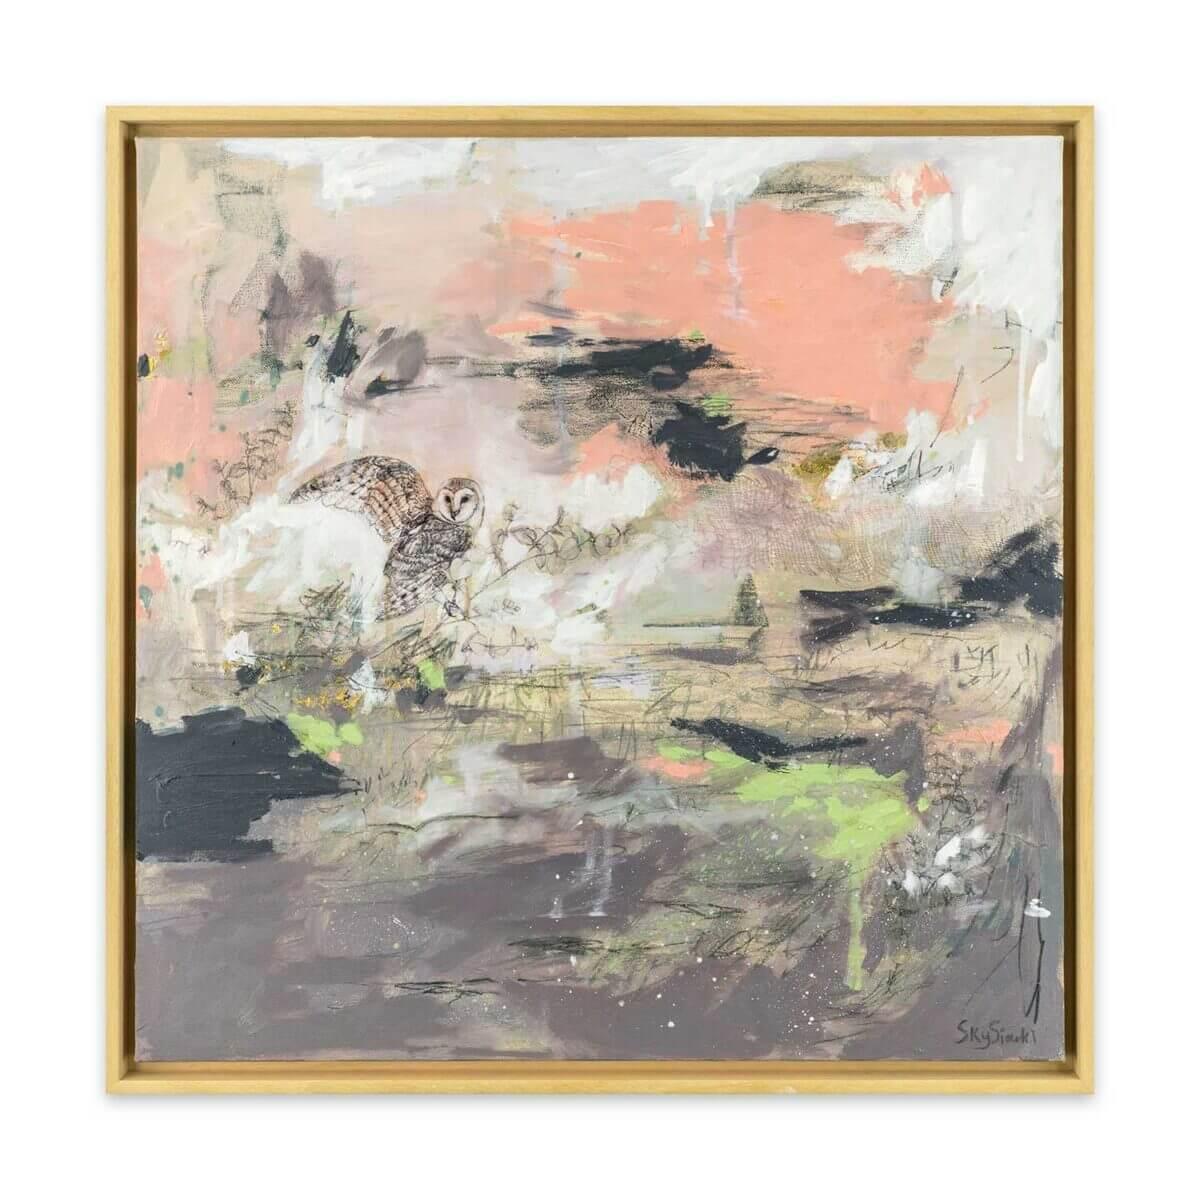 Sky-Siouki-Moorland-Painting